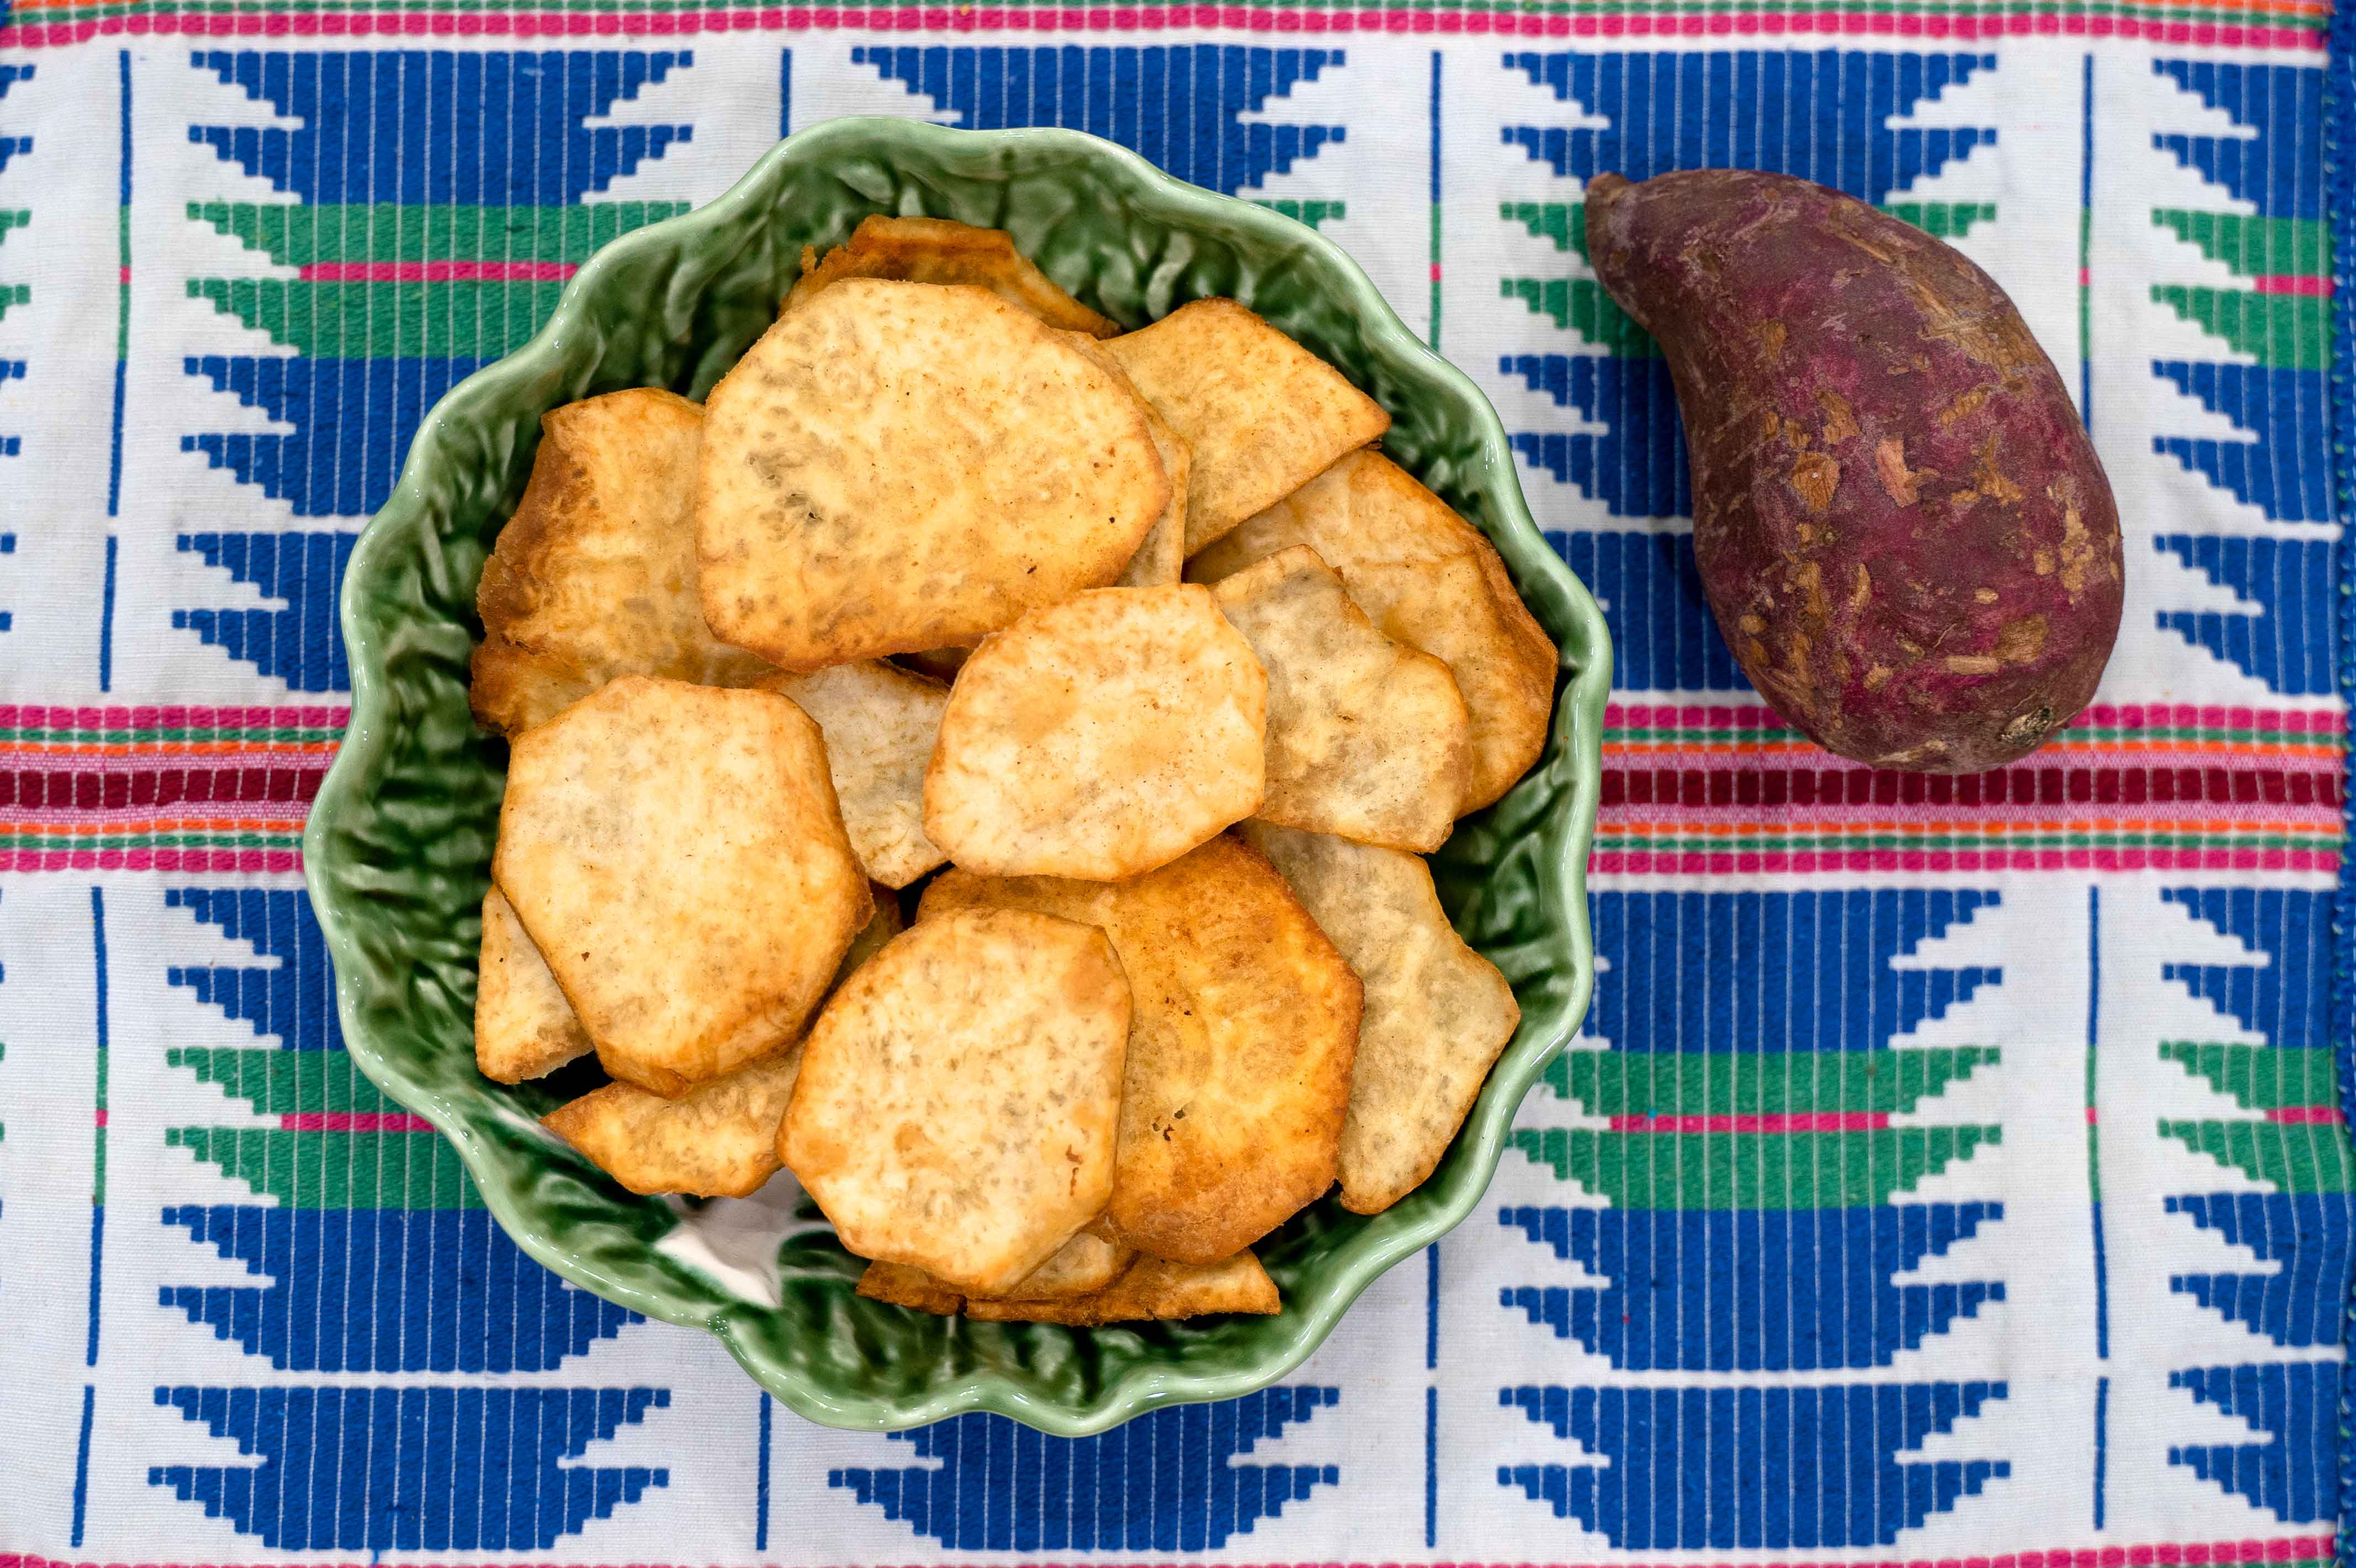 Fried boniato chip recipe